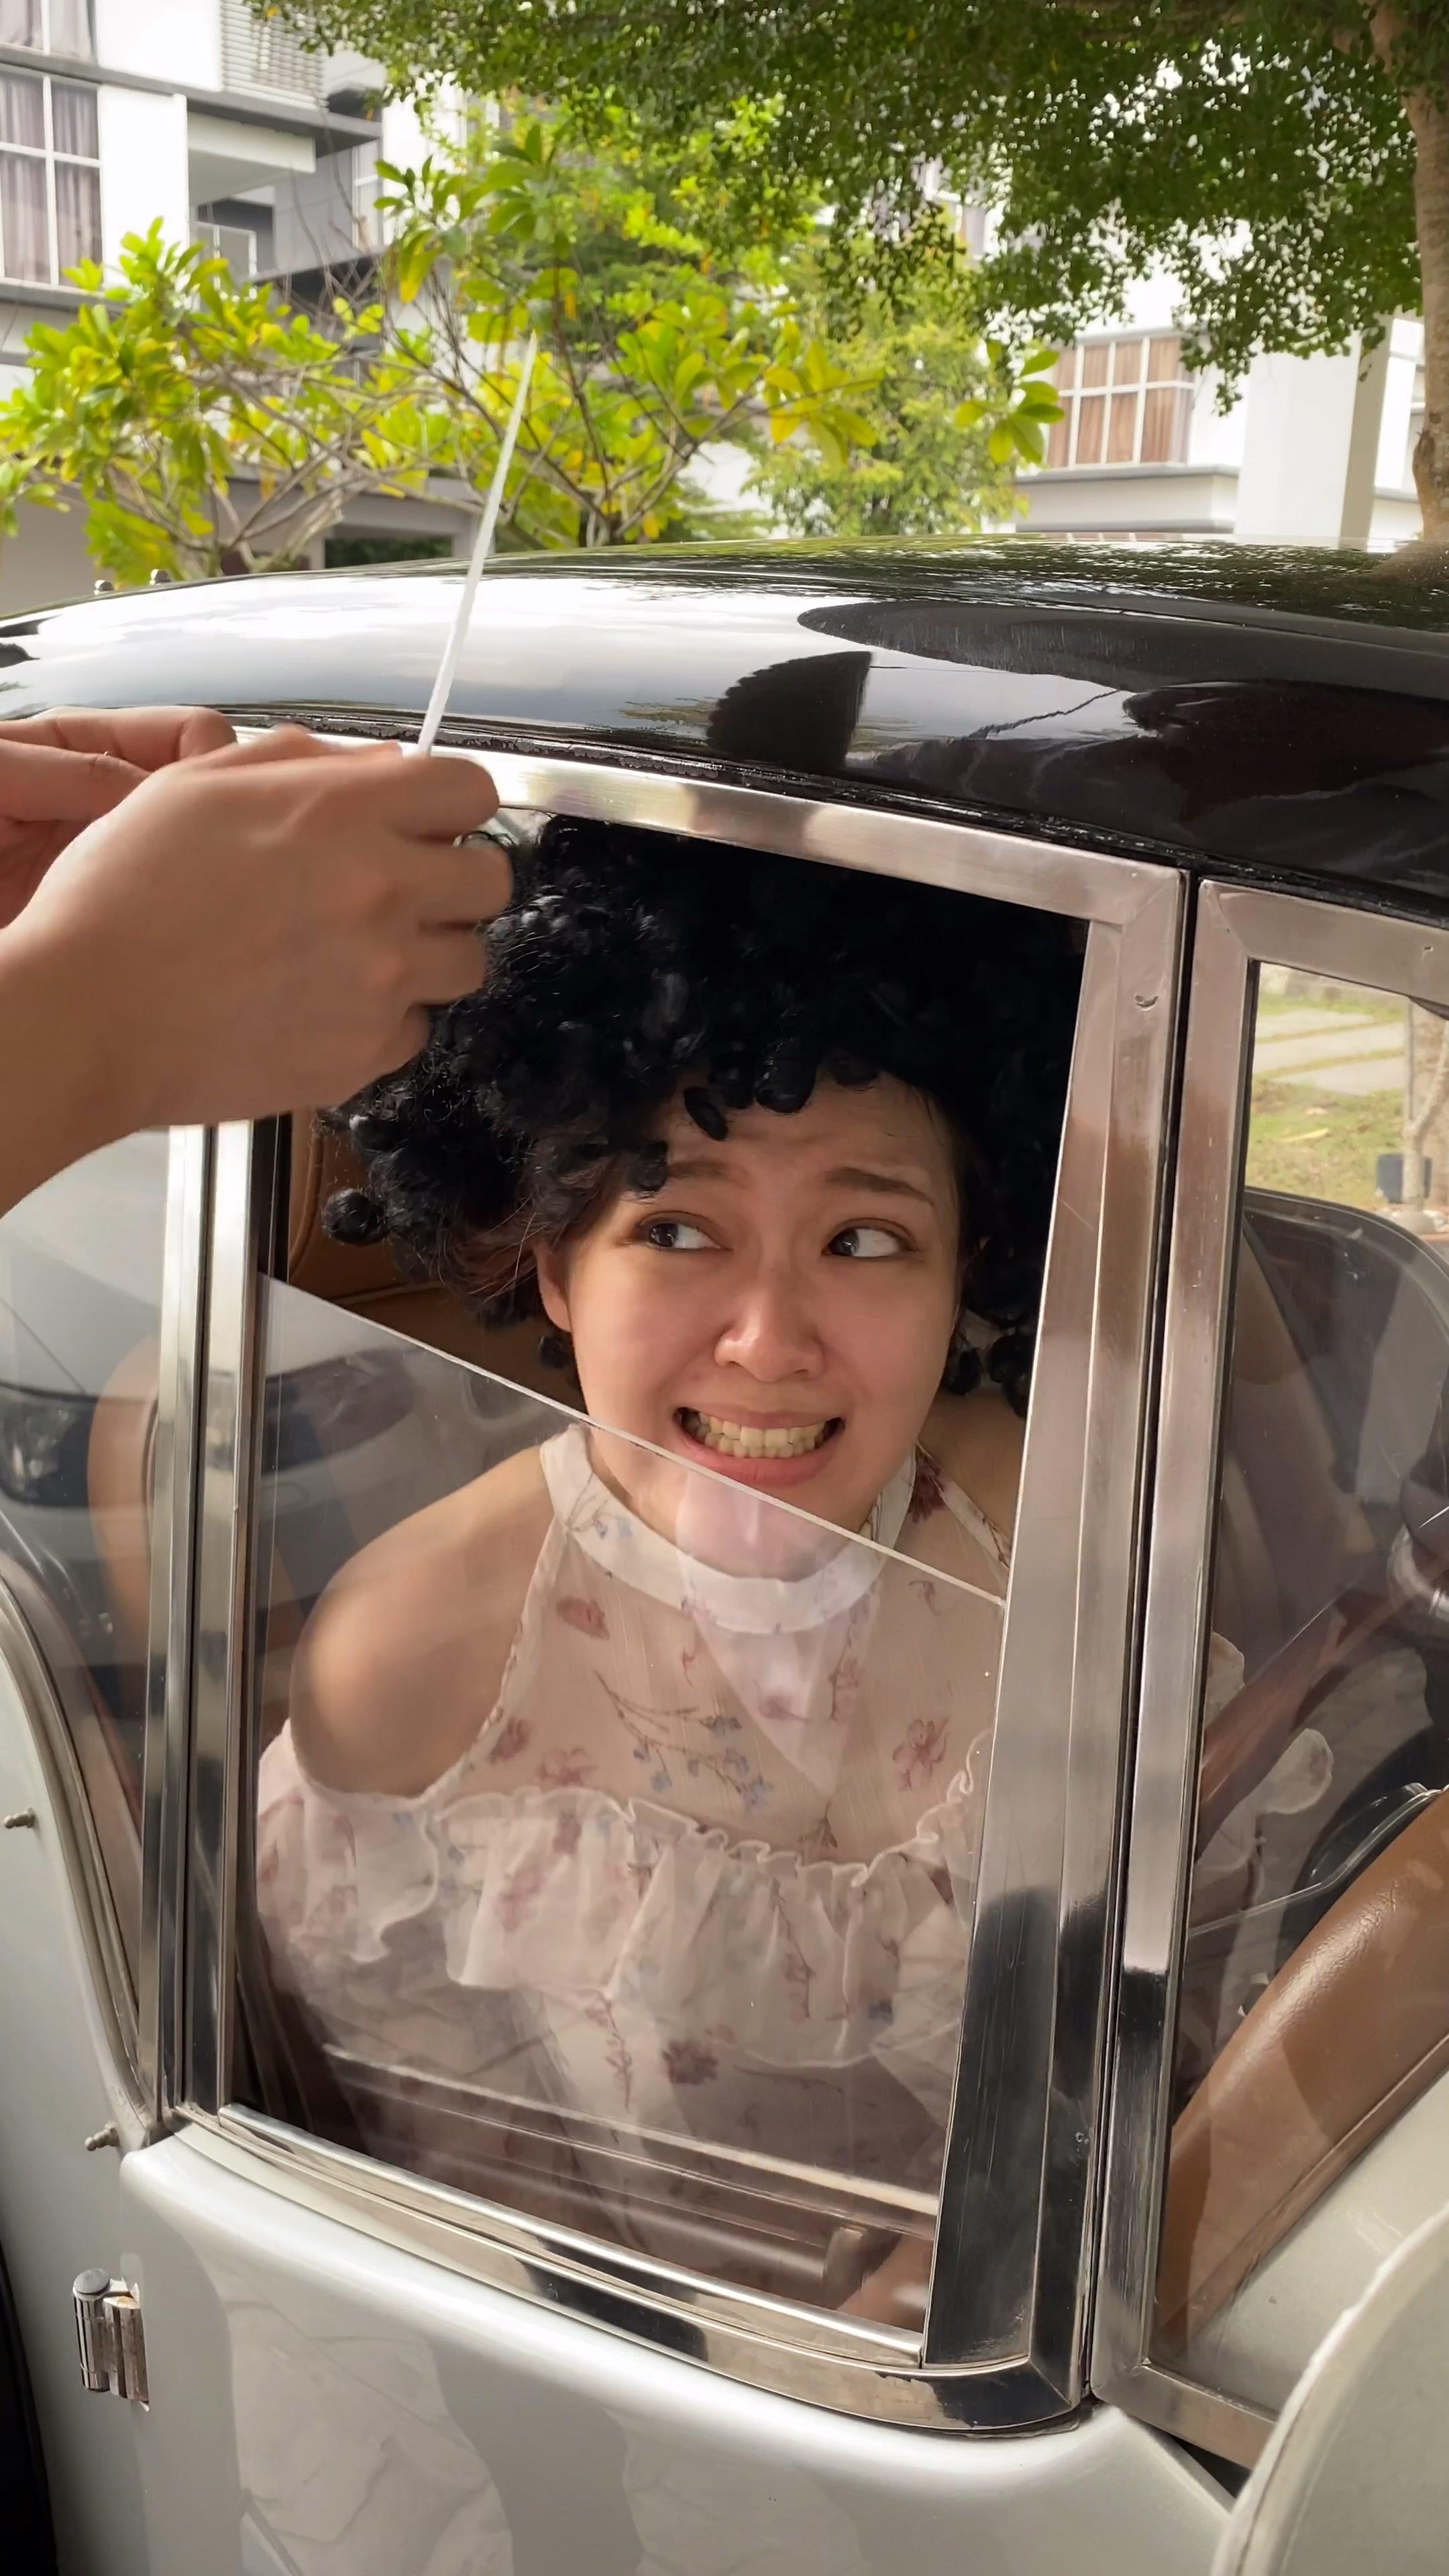 Nooo!! Eh.. who is this? #yyfara #oeacademy #sister #foryou #foryoupage #fyp #funny #omg #tiktok #tiktokindia #tiktokmalaysia #tiktokindonesia #afro tiktok